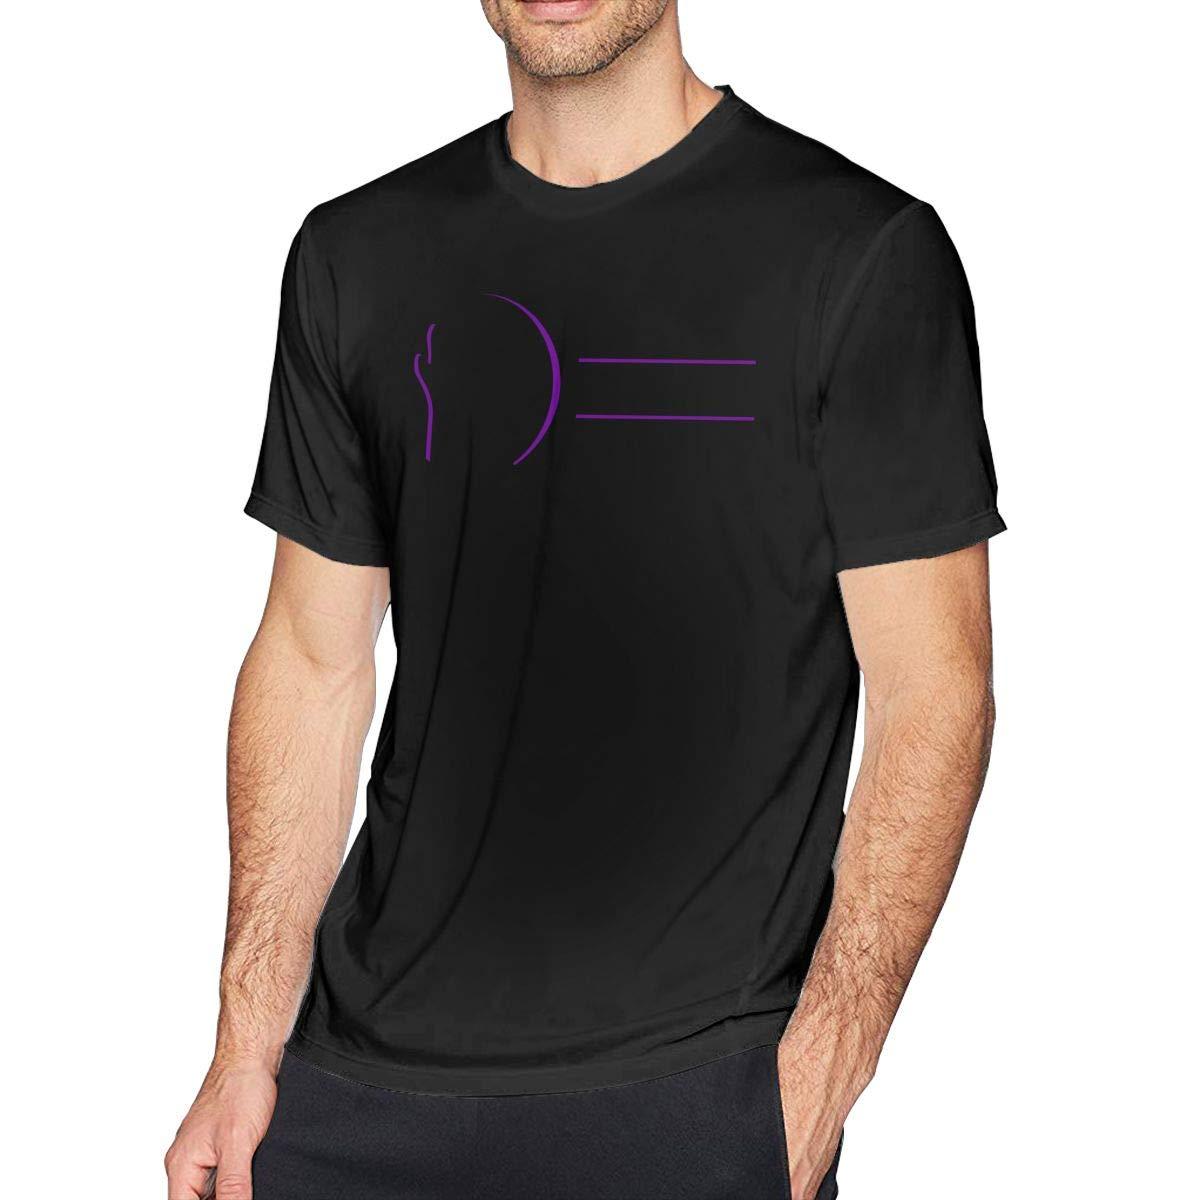 Aifreedom1 Late Night Distinctive Tshirt Black 4